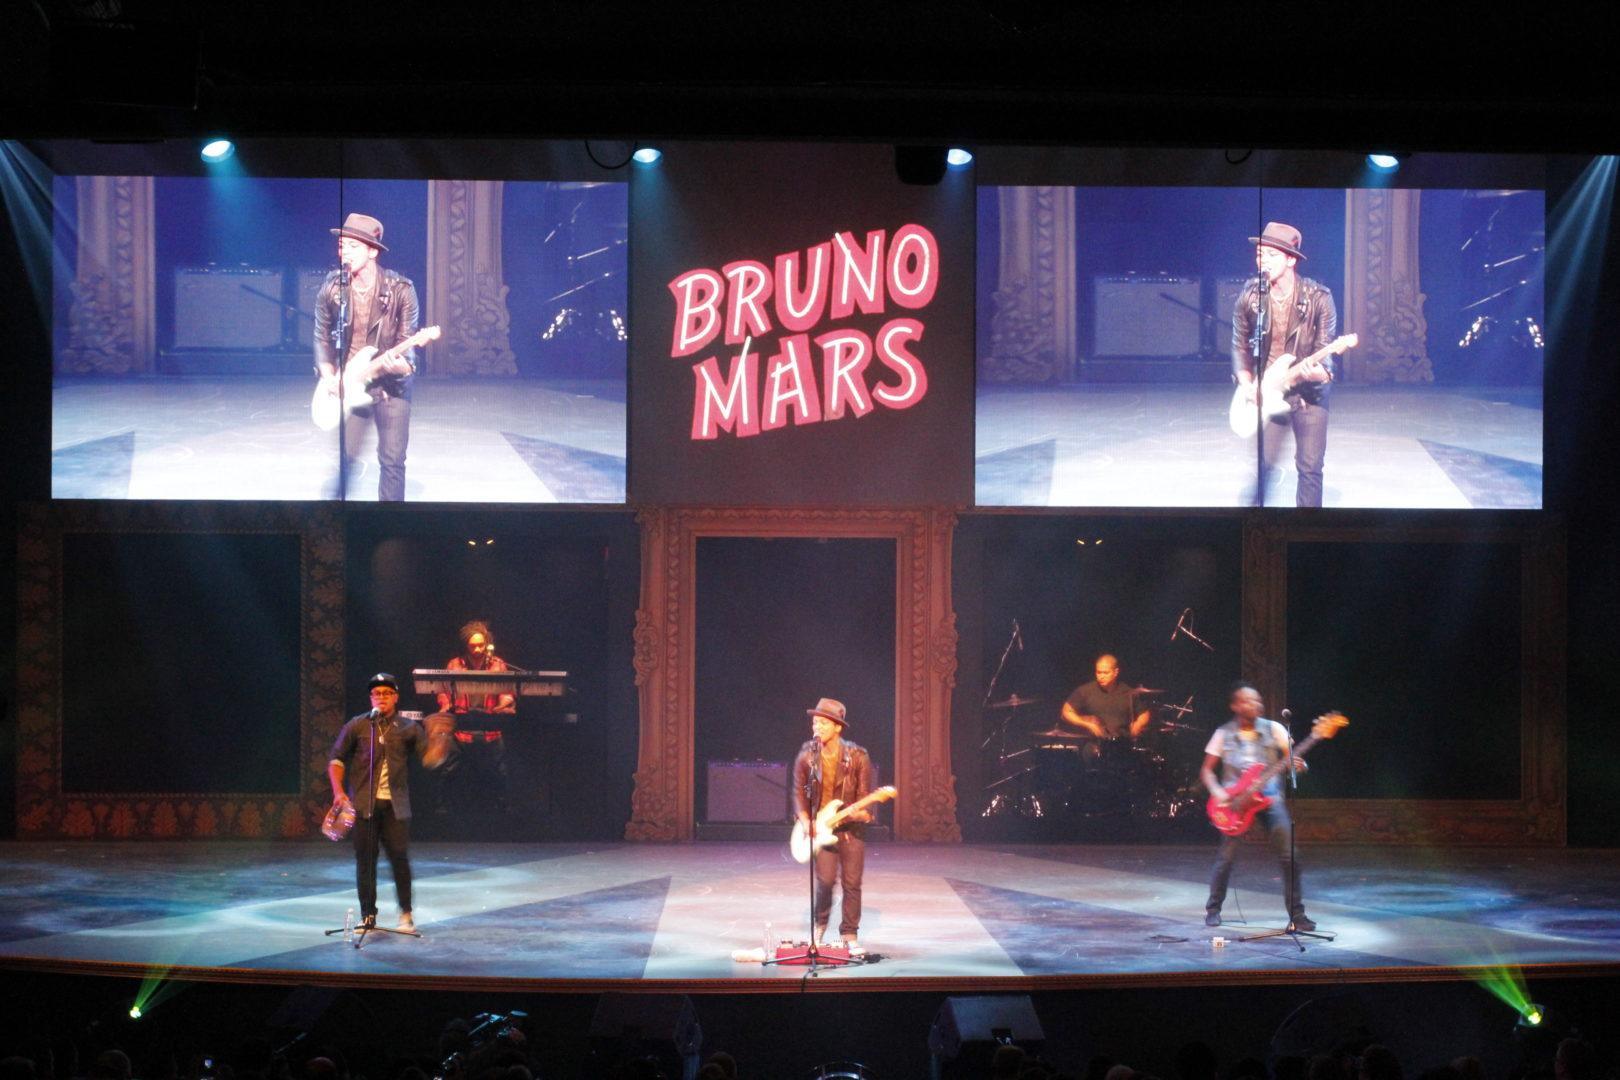 Macys Glamorama Bruno Mars Barco I6xp LED Walls